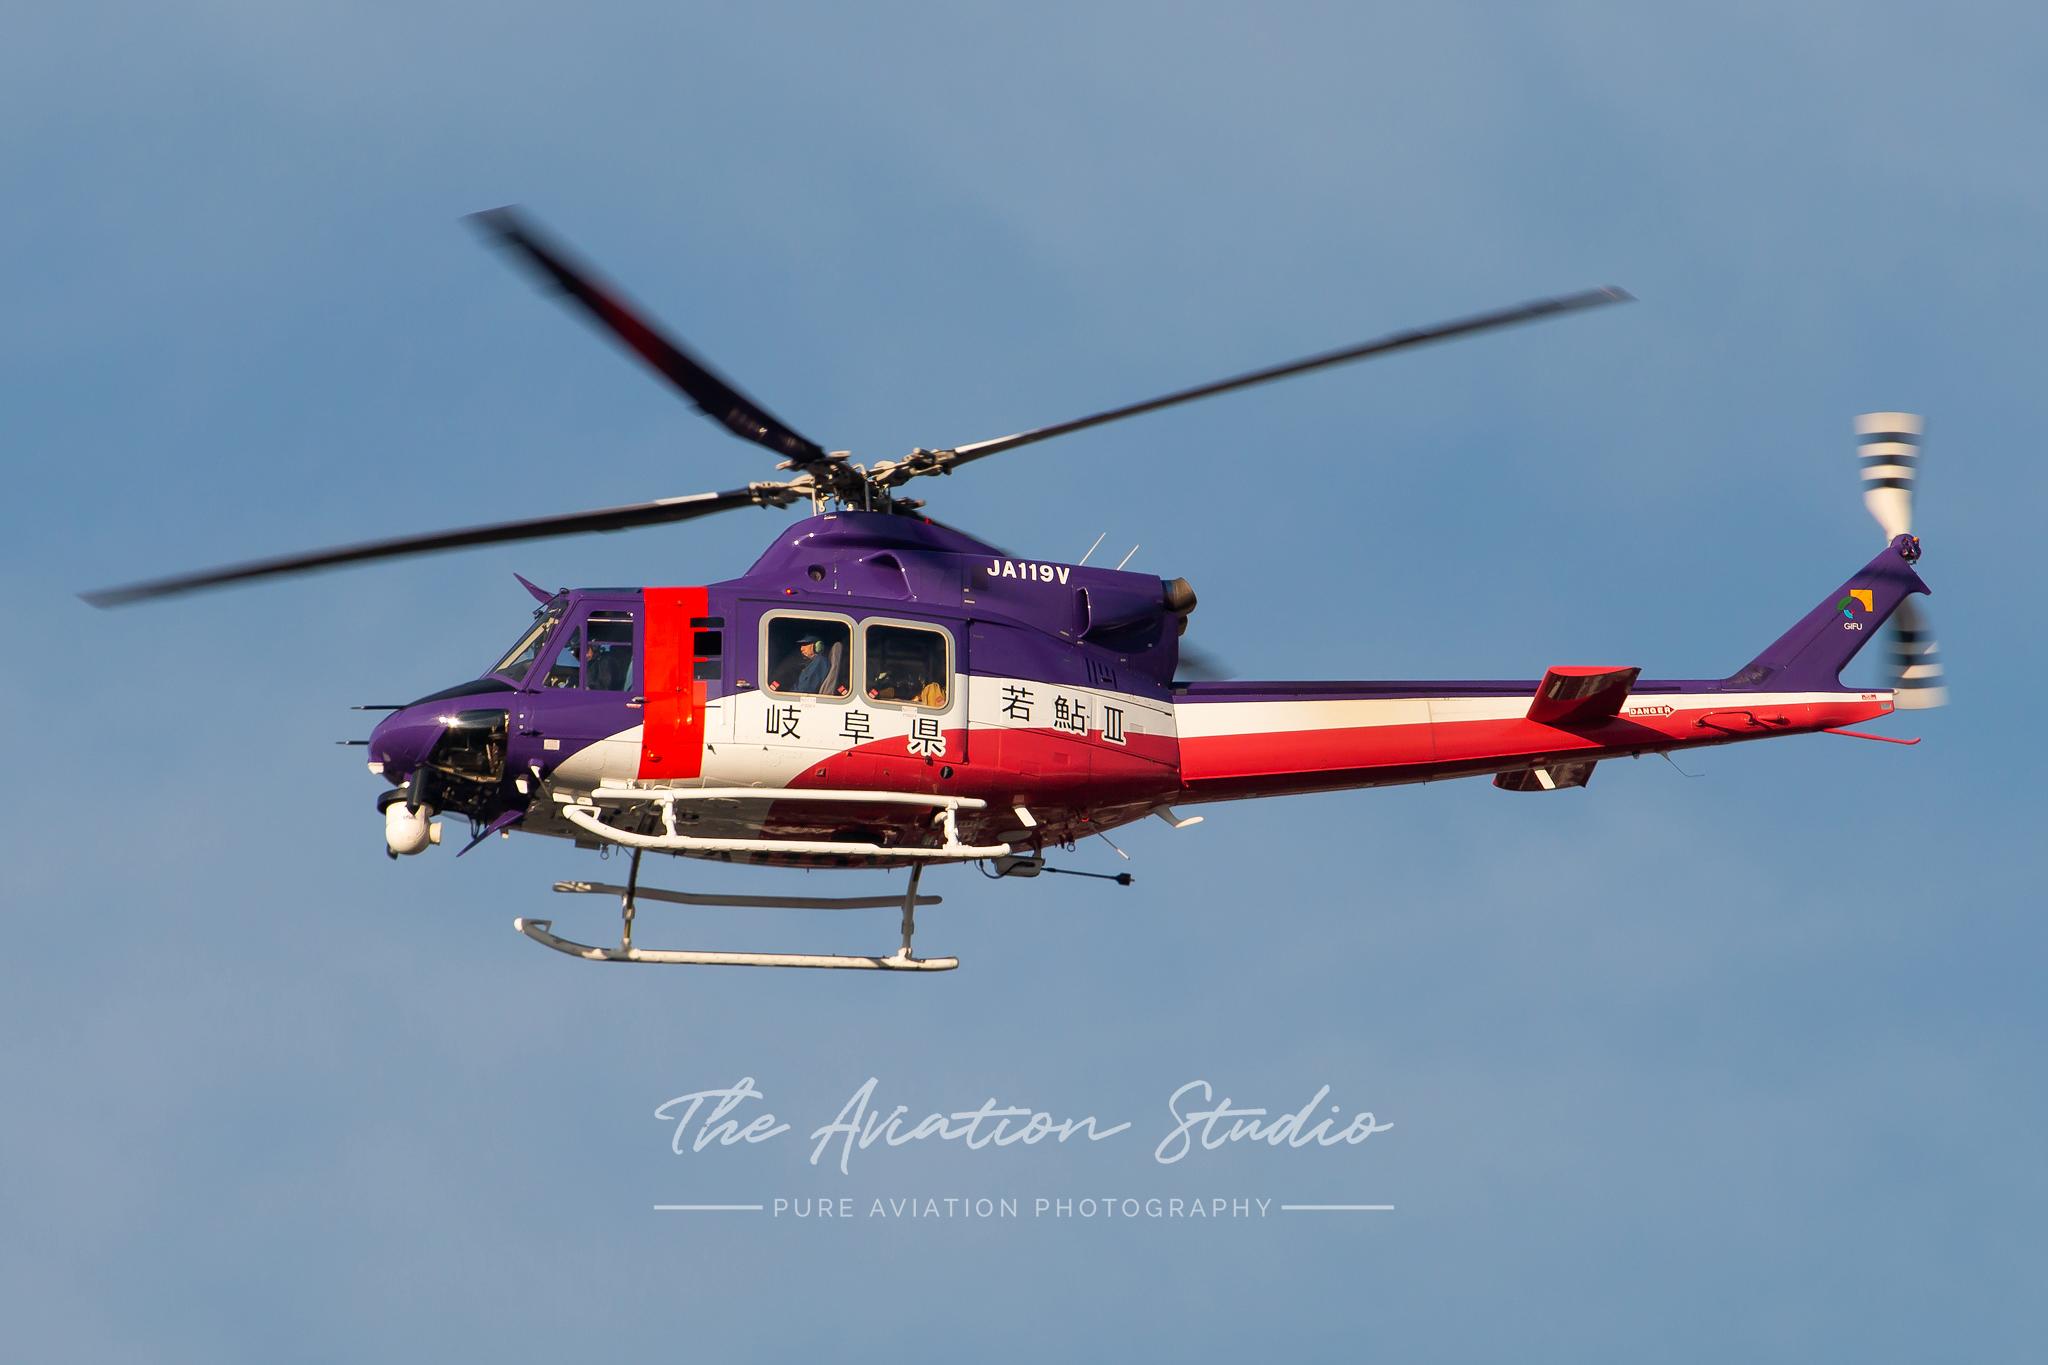 Gifu Prefectural Police Bell 412EP JA119V arrives at Gifu (Image: Brock Little)